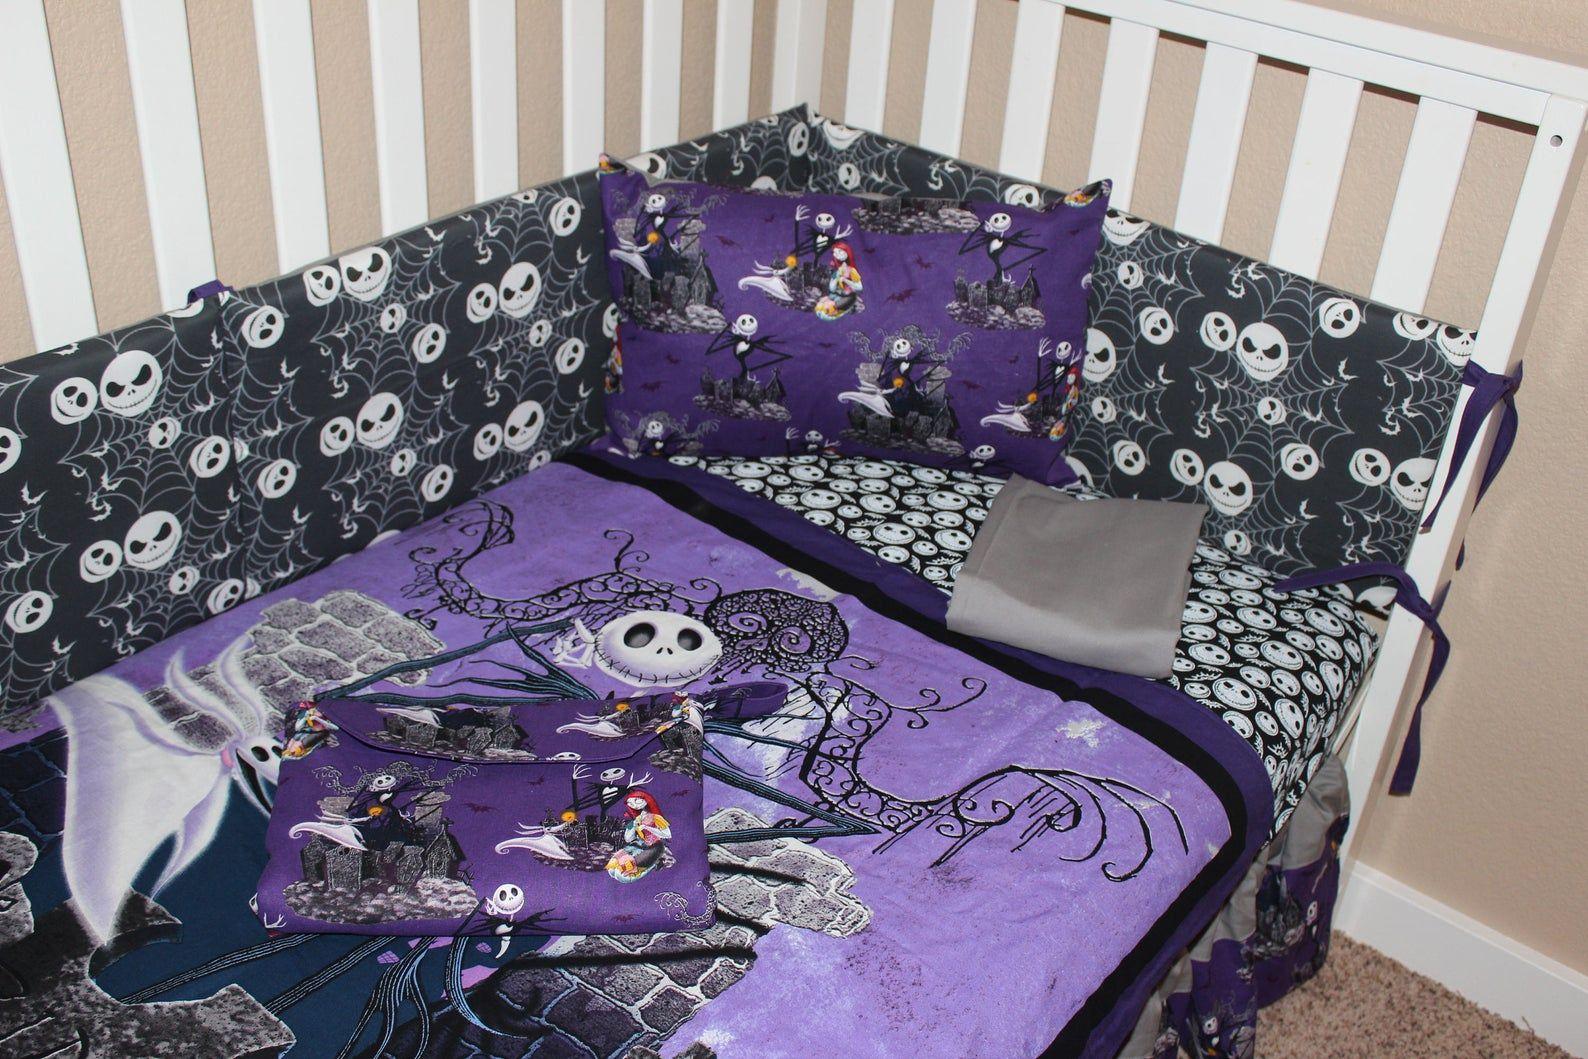 Jack Skellington Crib Baby Bedding Set Nightmare Etsy In 2020 Baby Bedding Sets Baby Crib Bedding Baby Bed